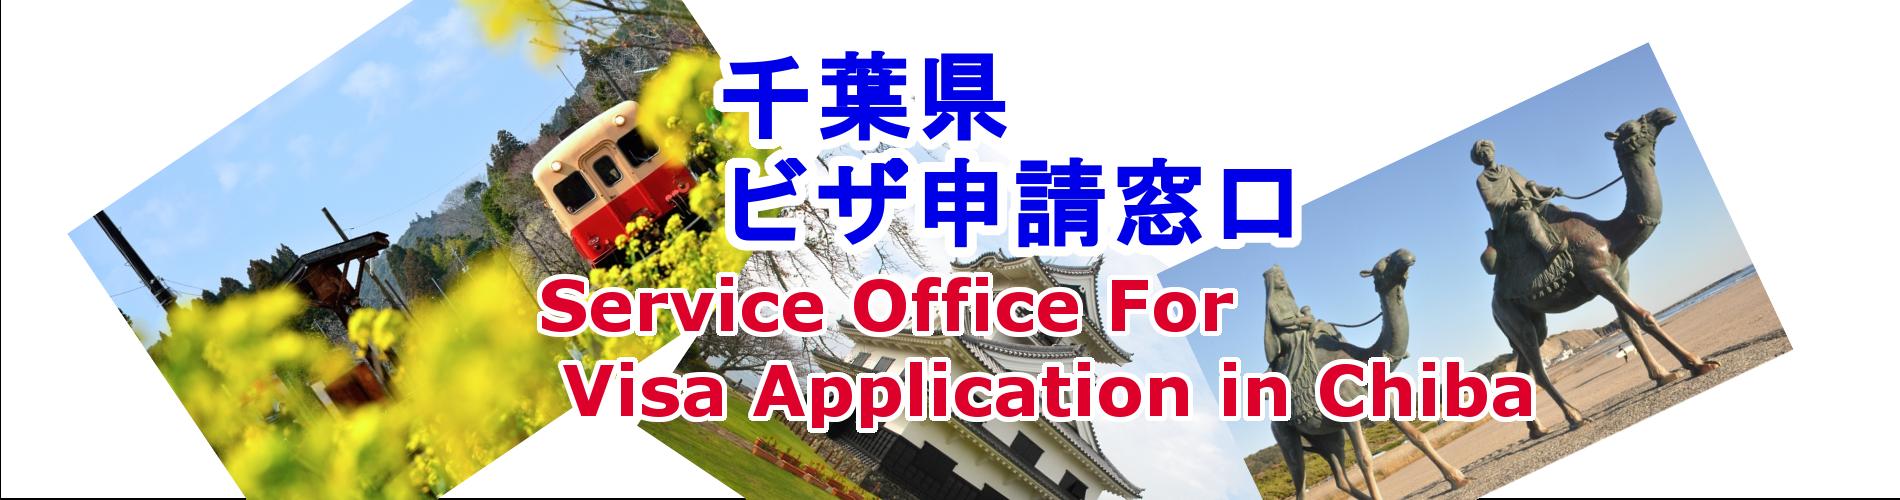 千葉県ビザ申請窓口